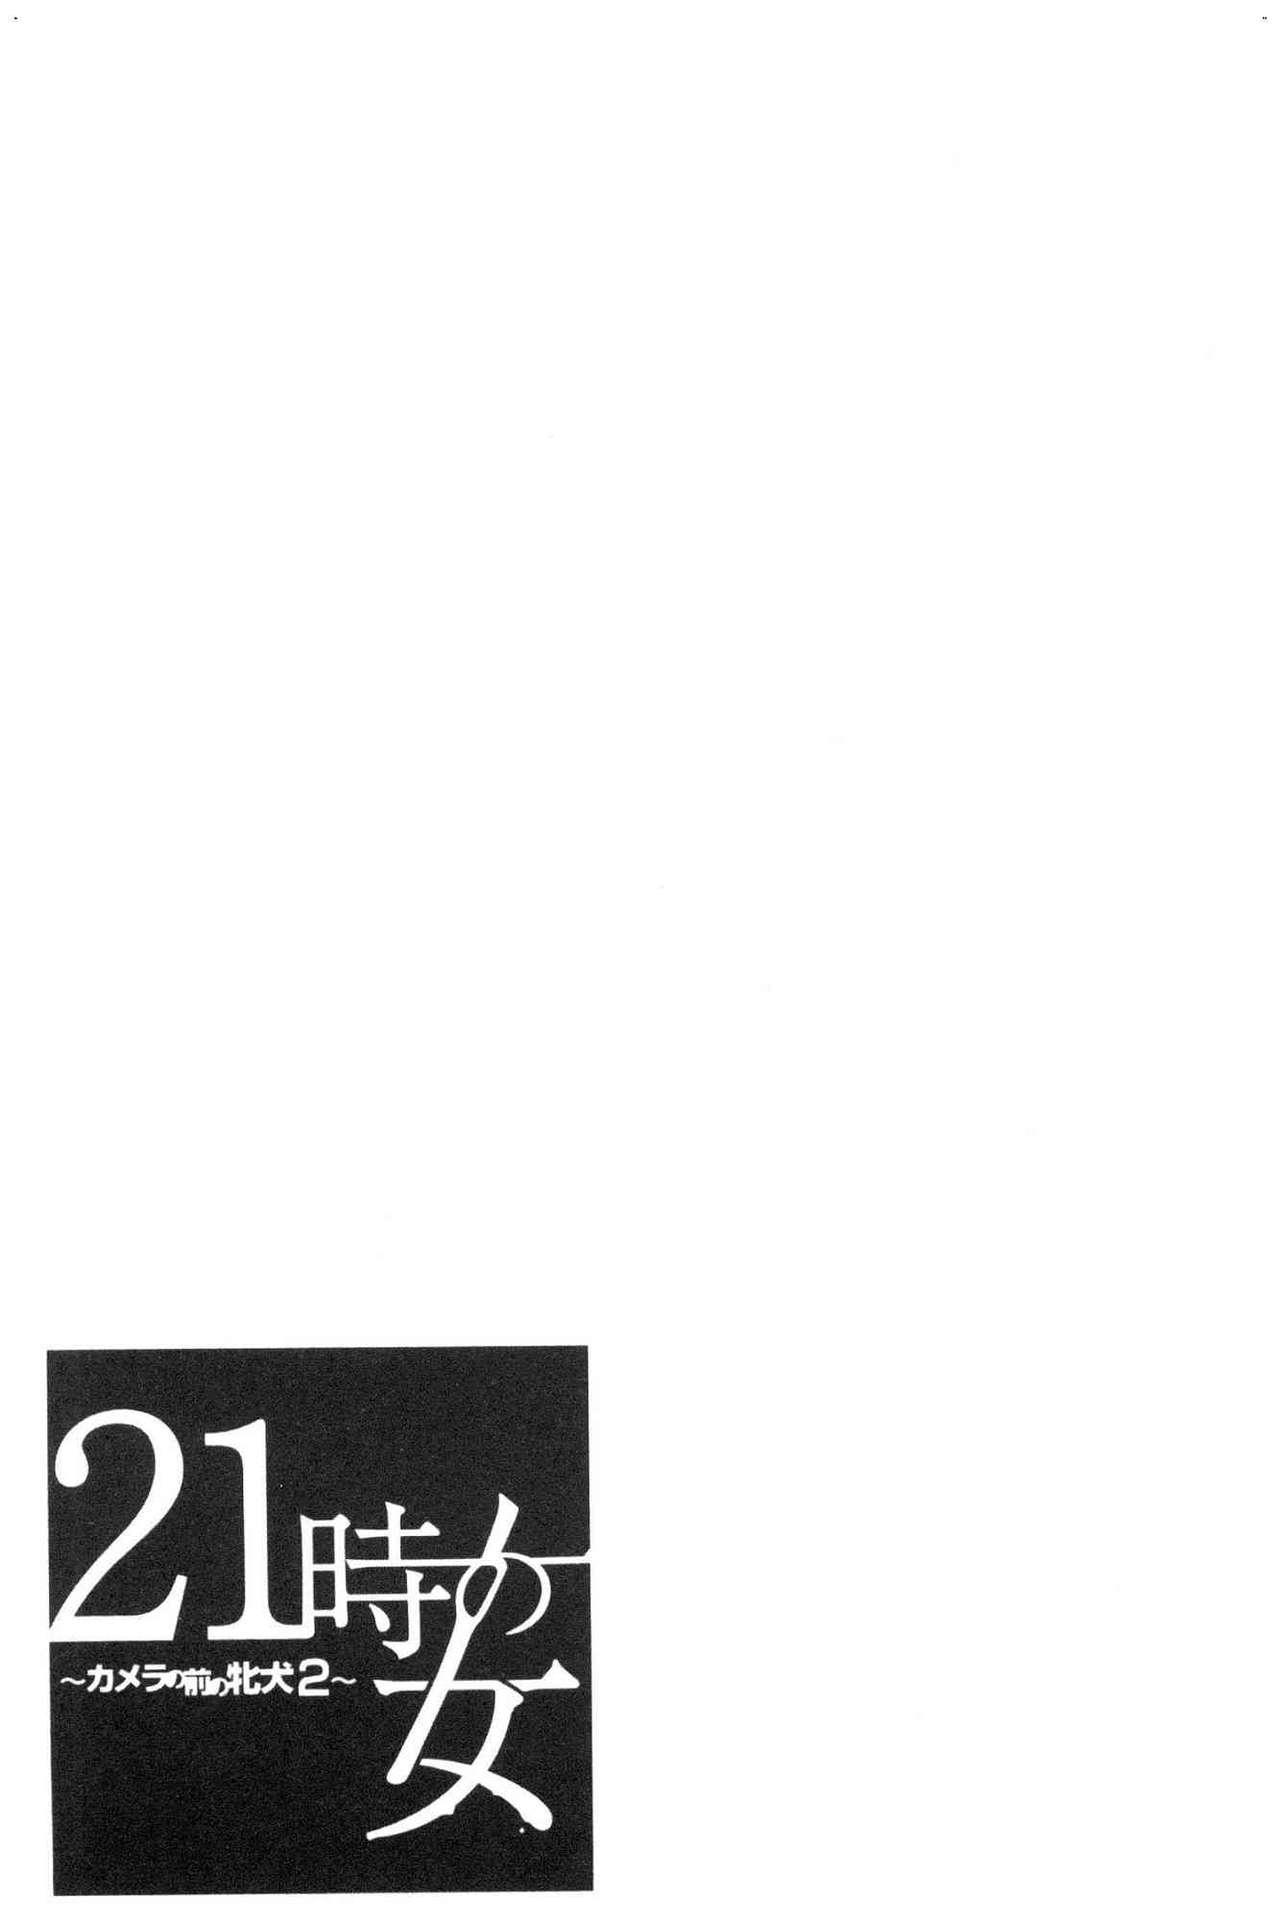 [Gotoh Akira]  21-ji no Onna ~Camera no Mae no Mesuinu~ 2 | 21時之女 ~鏡頭前的牝犬~ 2 [Chinese] 158